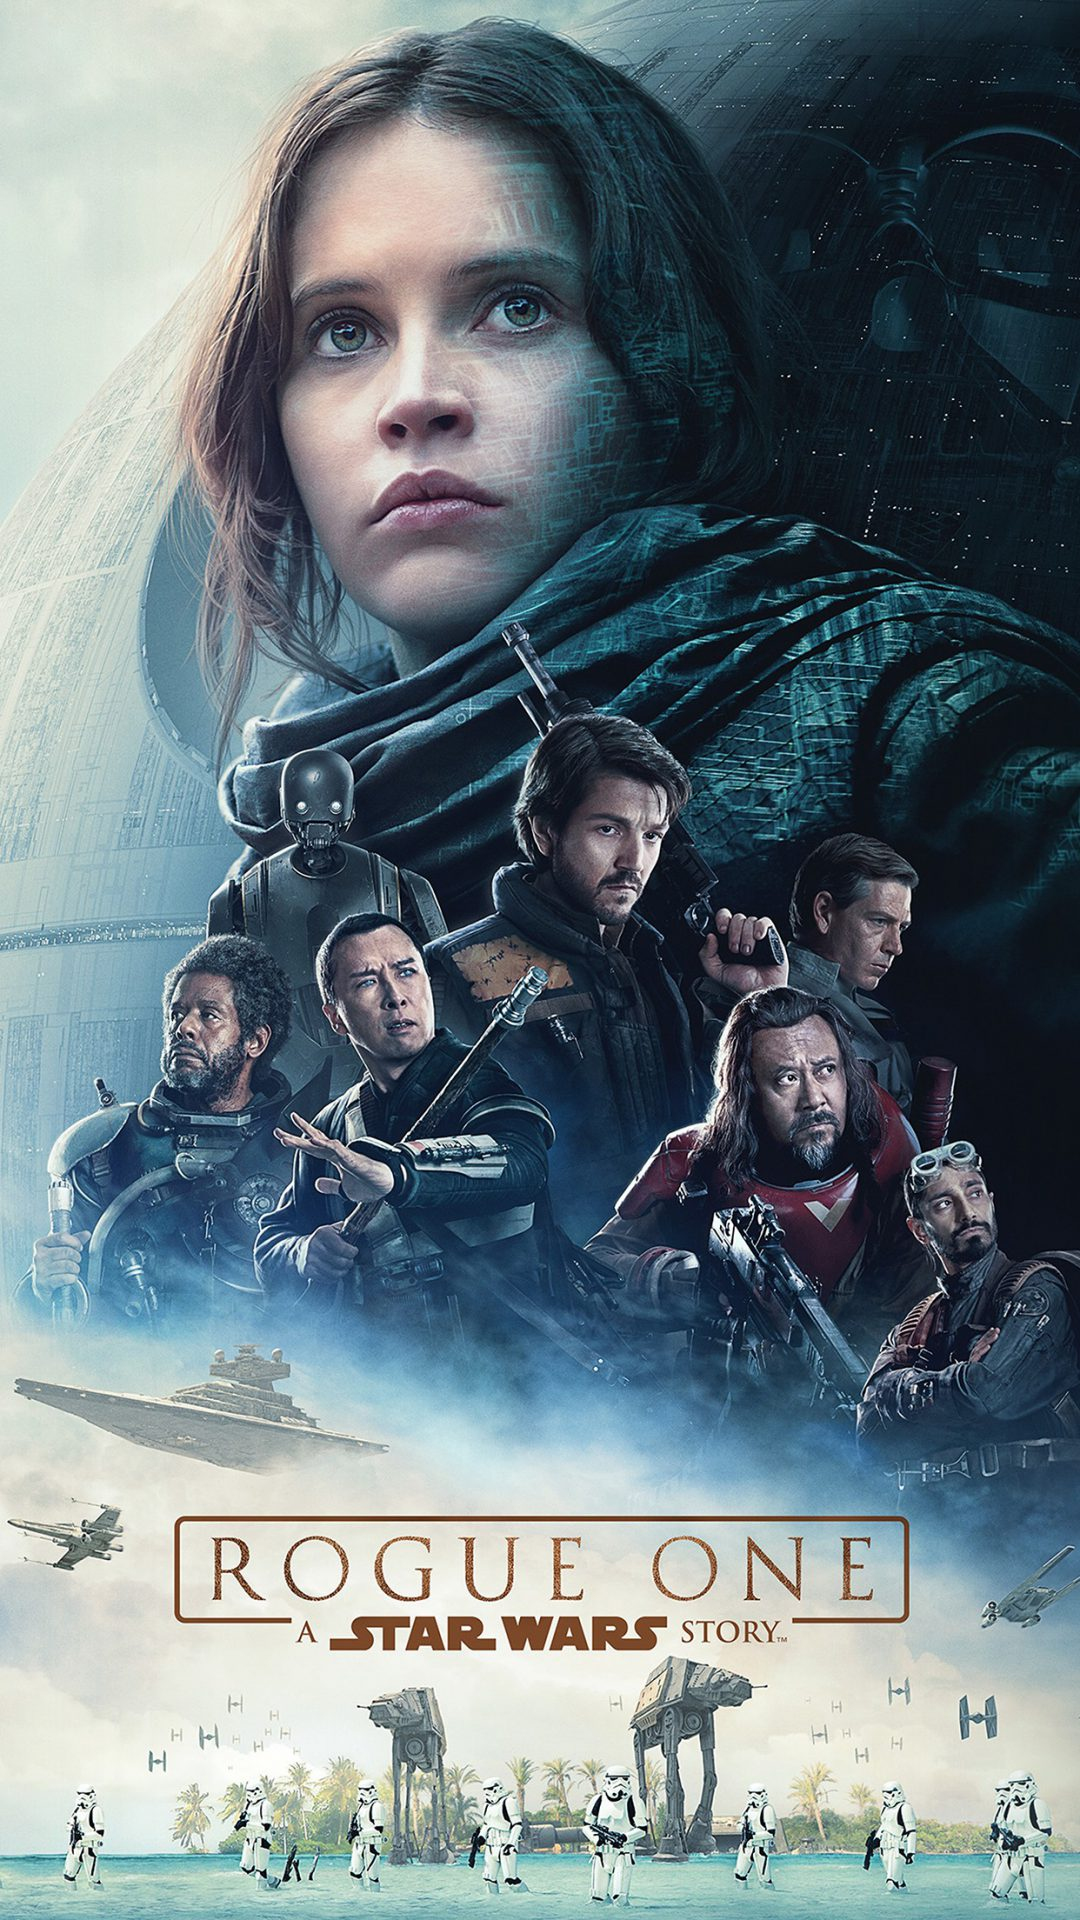 Rogue One Starwars Movie